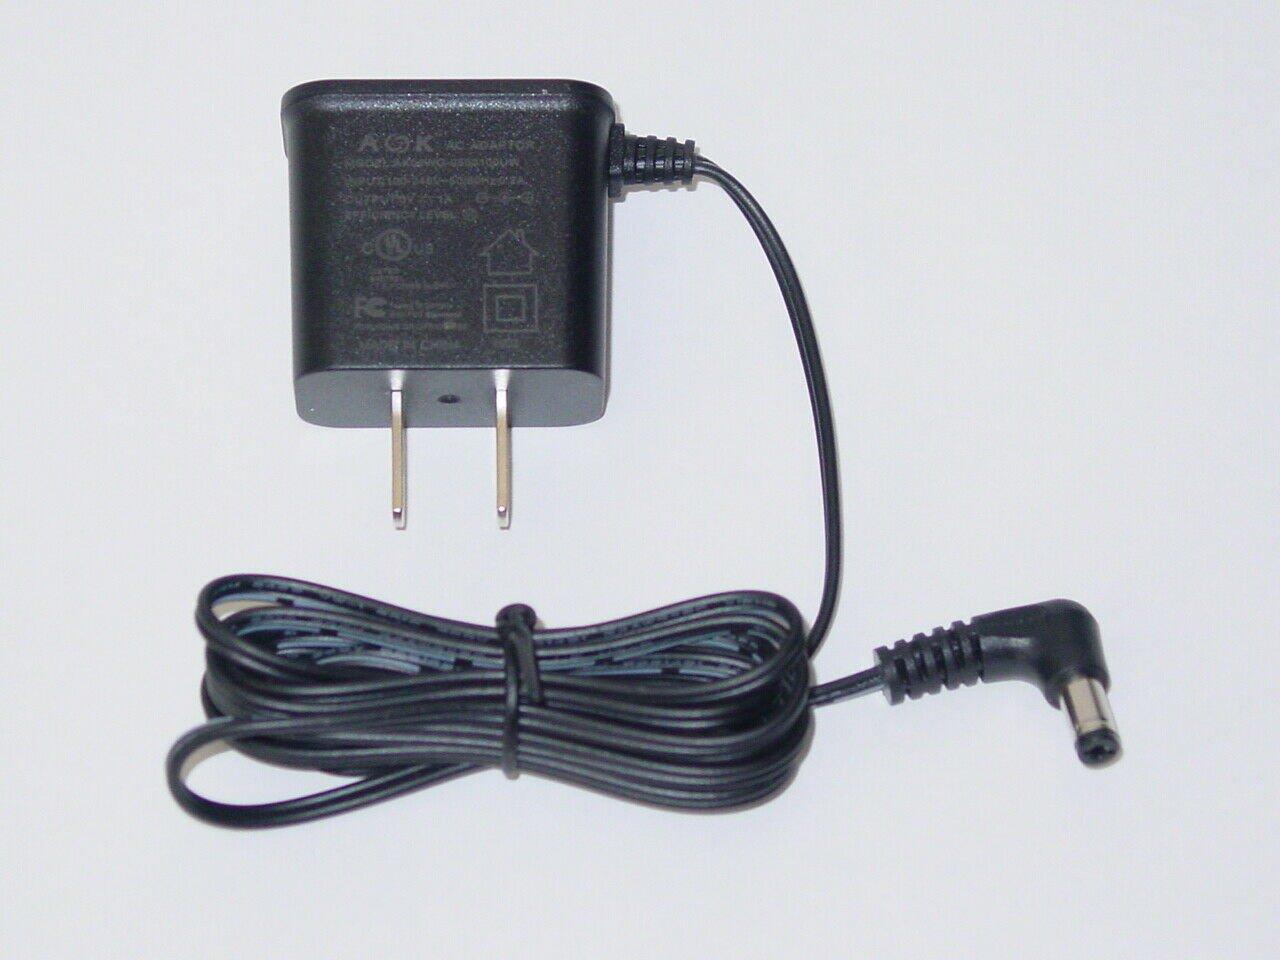 AOK AK06WG-0500100UW AC Power Adapter 5V 1A